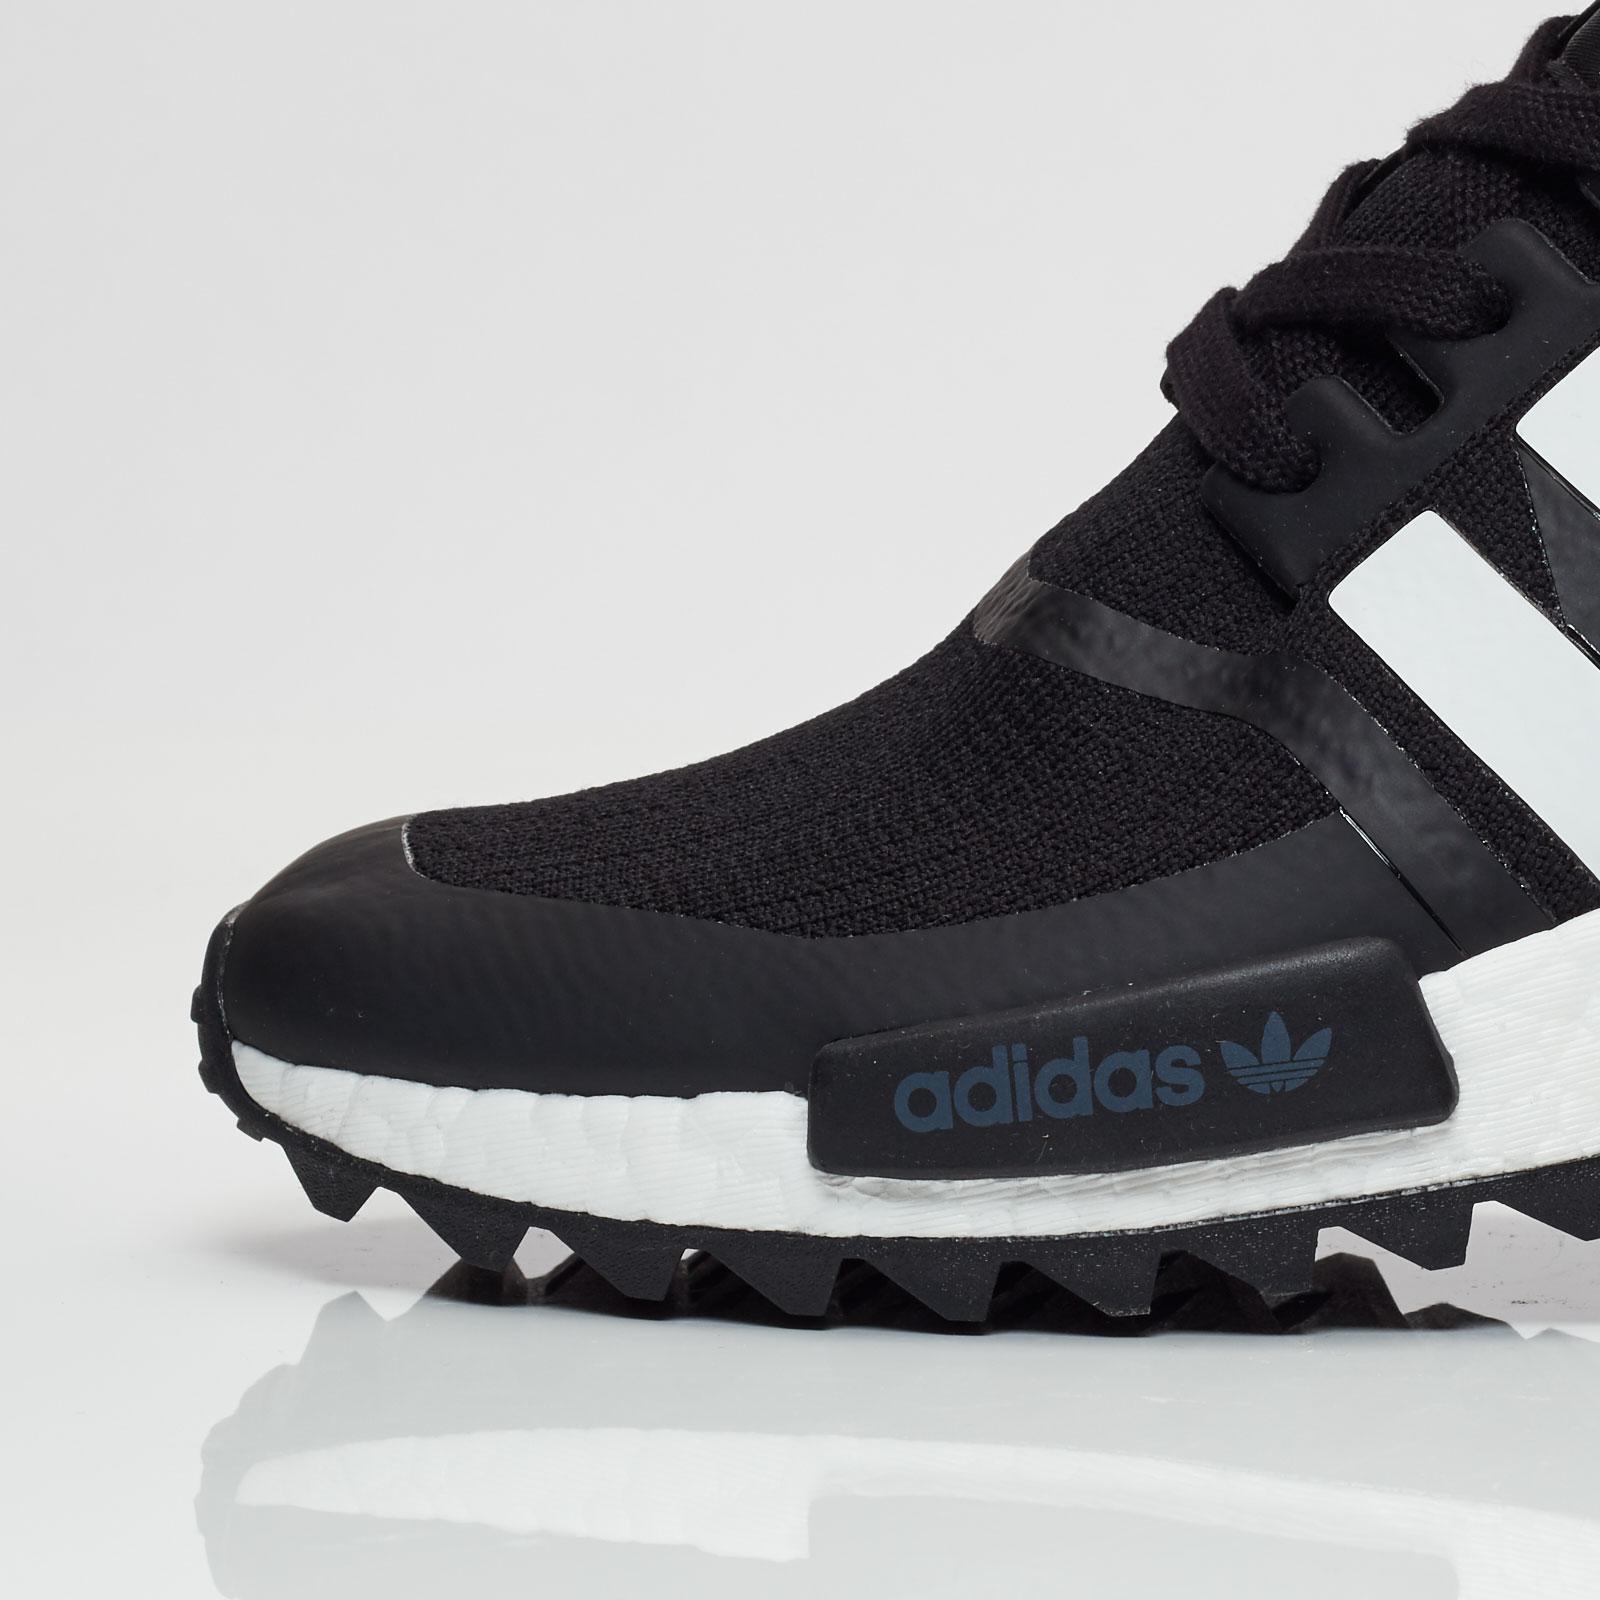 finest selection d056d 2d1e0 adidas Wm Nmd Trail Pk - Ba7518 - Sneakersnstuff | sneakers ...